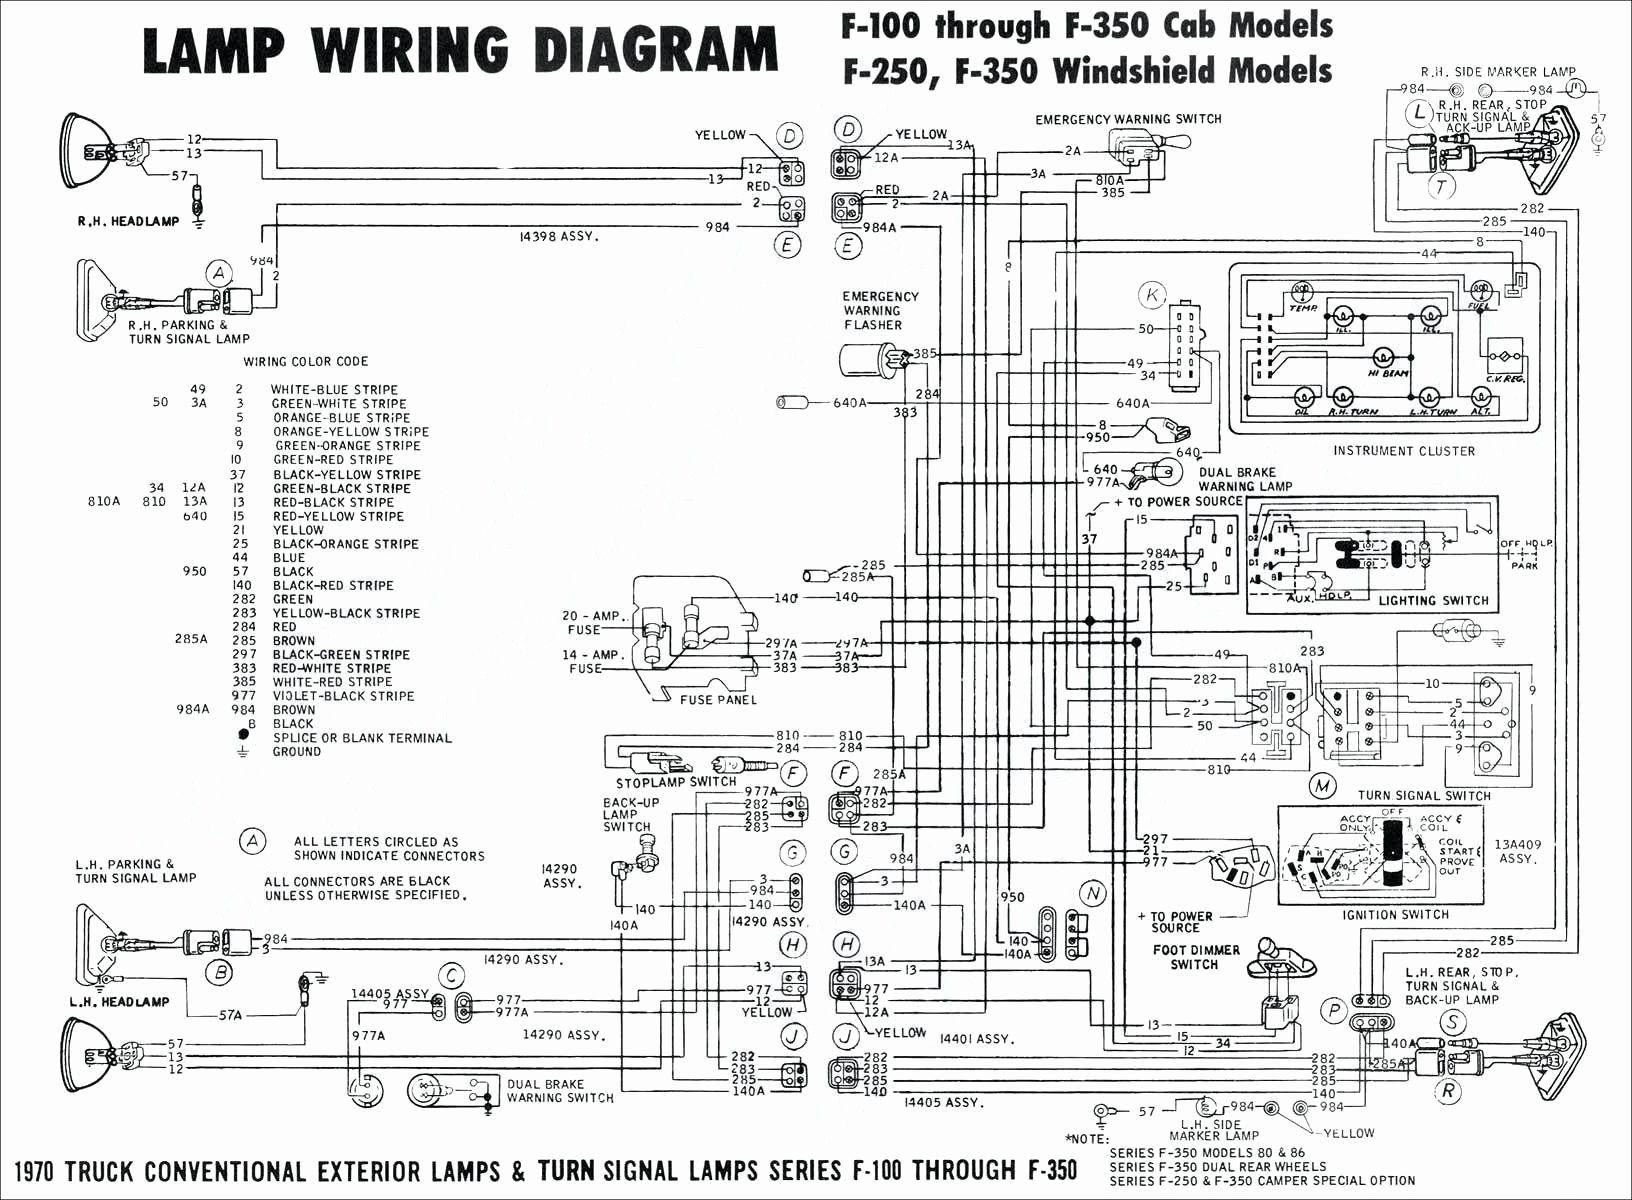 1996 Chevy S10 Wiring Diagram : 1996 Chevy S10 Starter